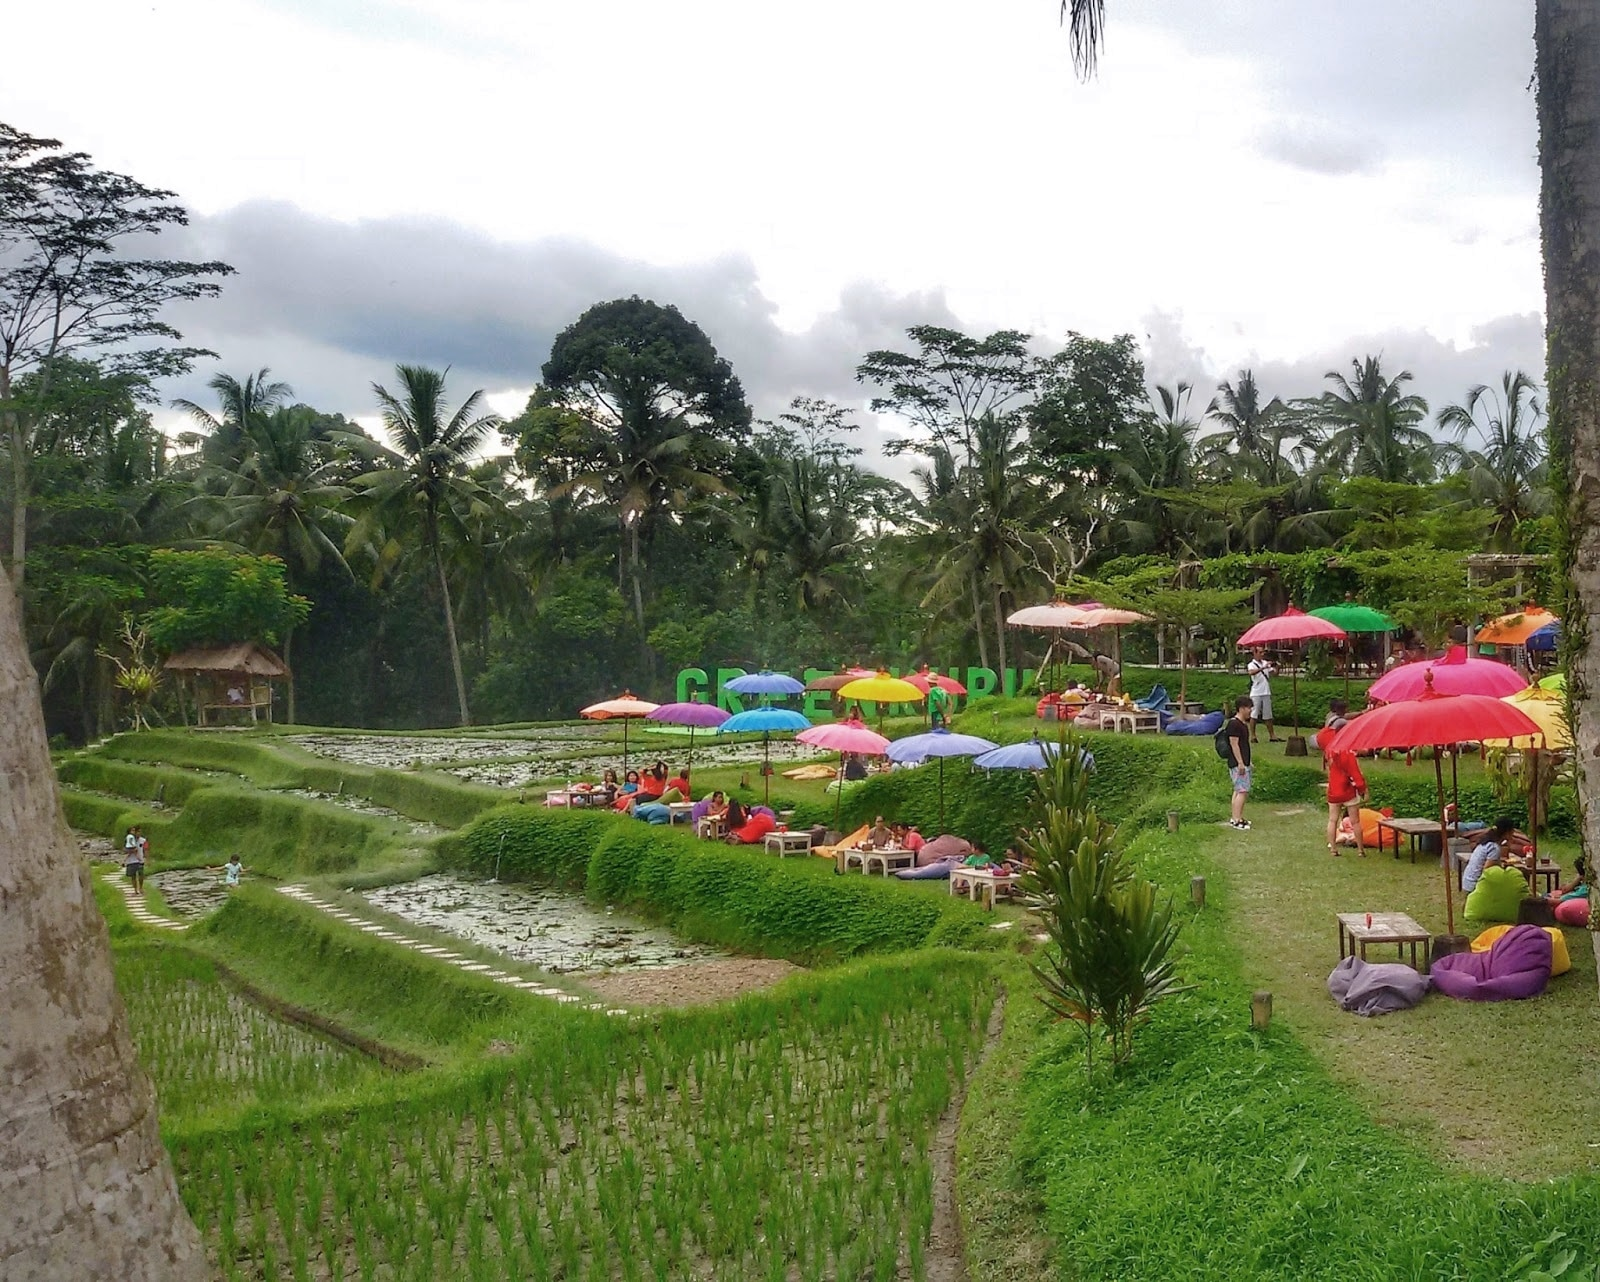 Green Kubu, Ubud, Bali (jasanusadewata)